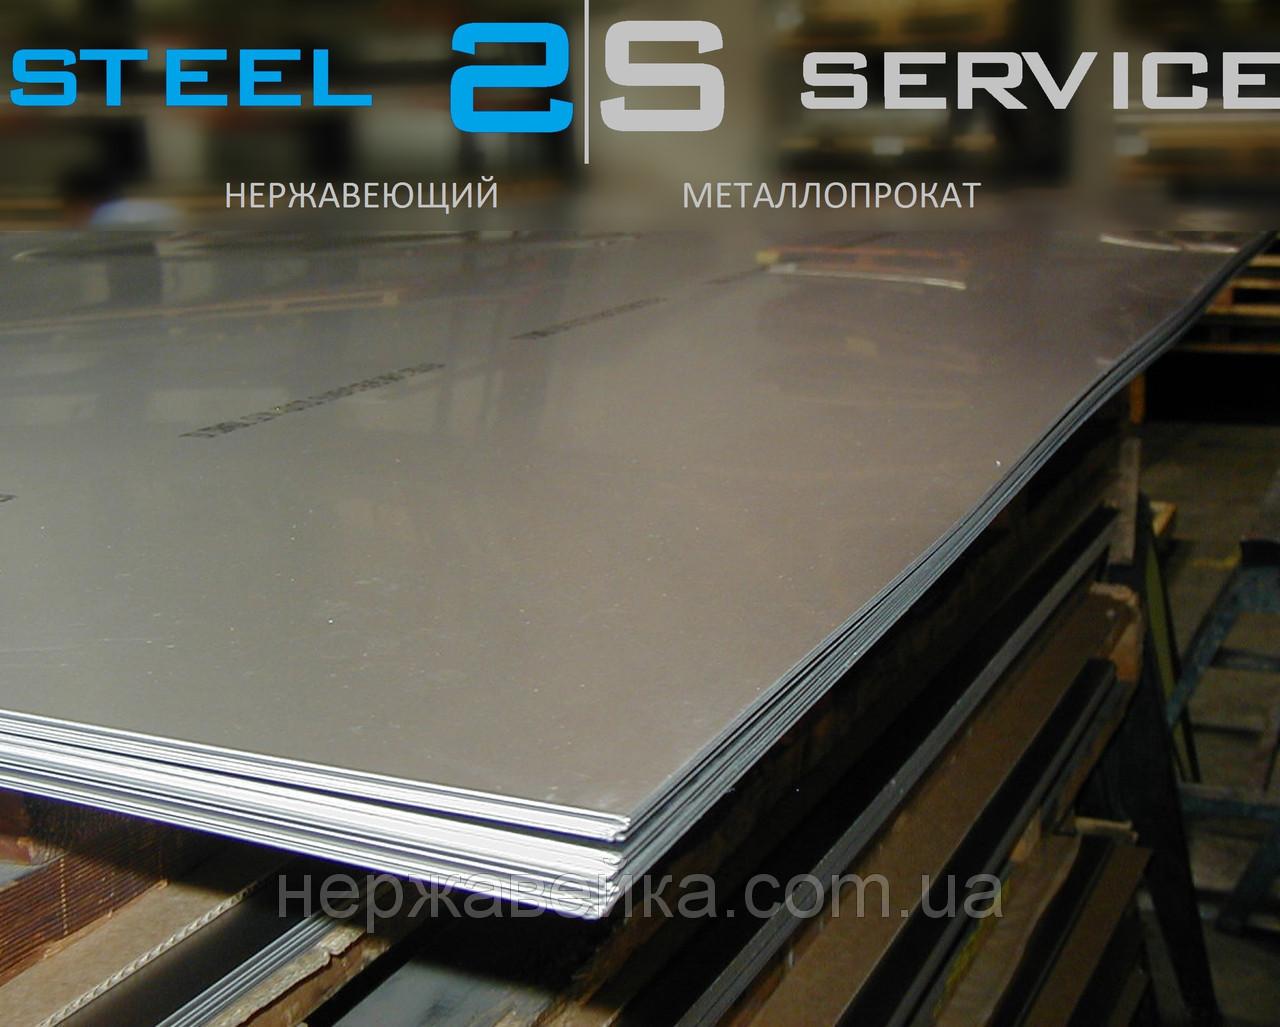 Нержавеющий лист 0,4х1000х2000мм AISI 430(12Х17) 4N - шлифованный, технический